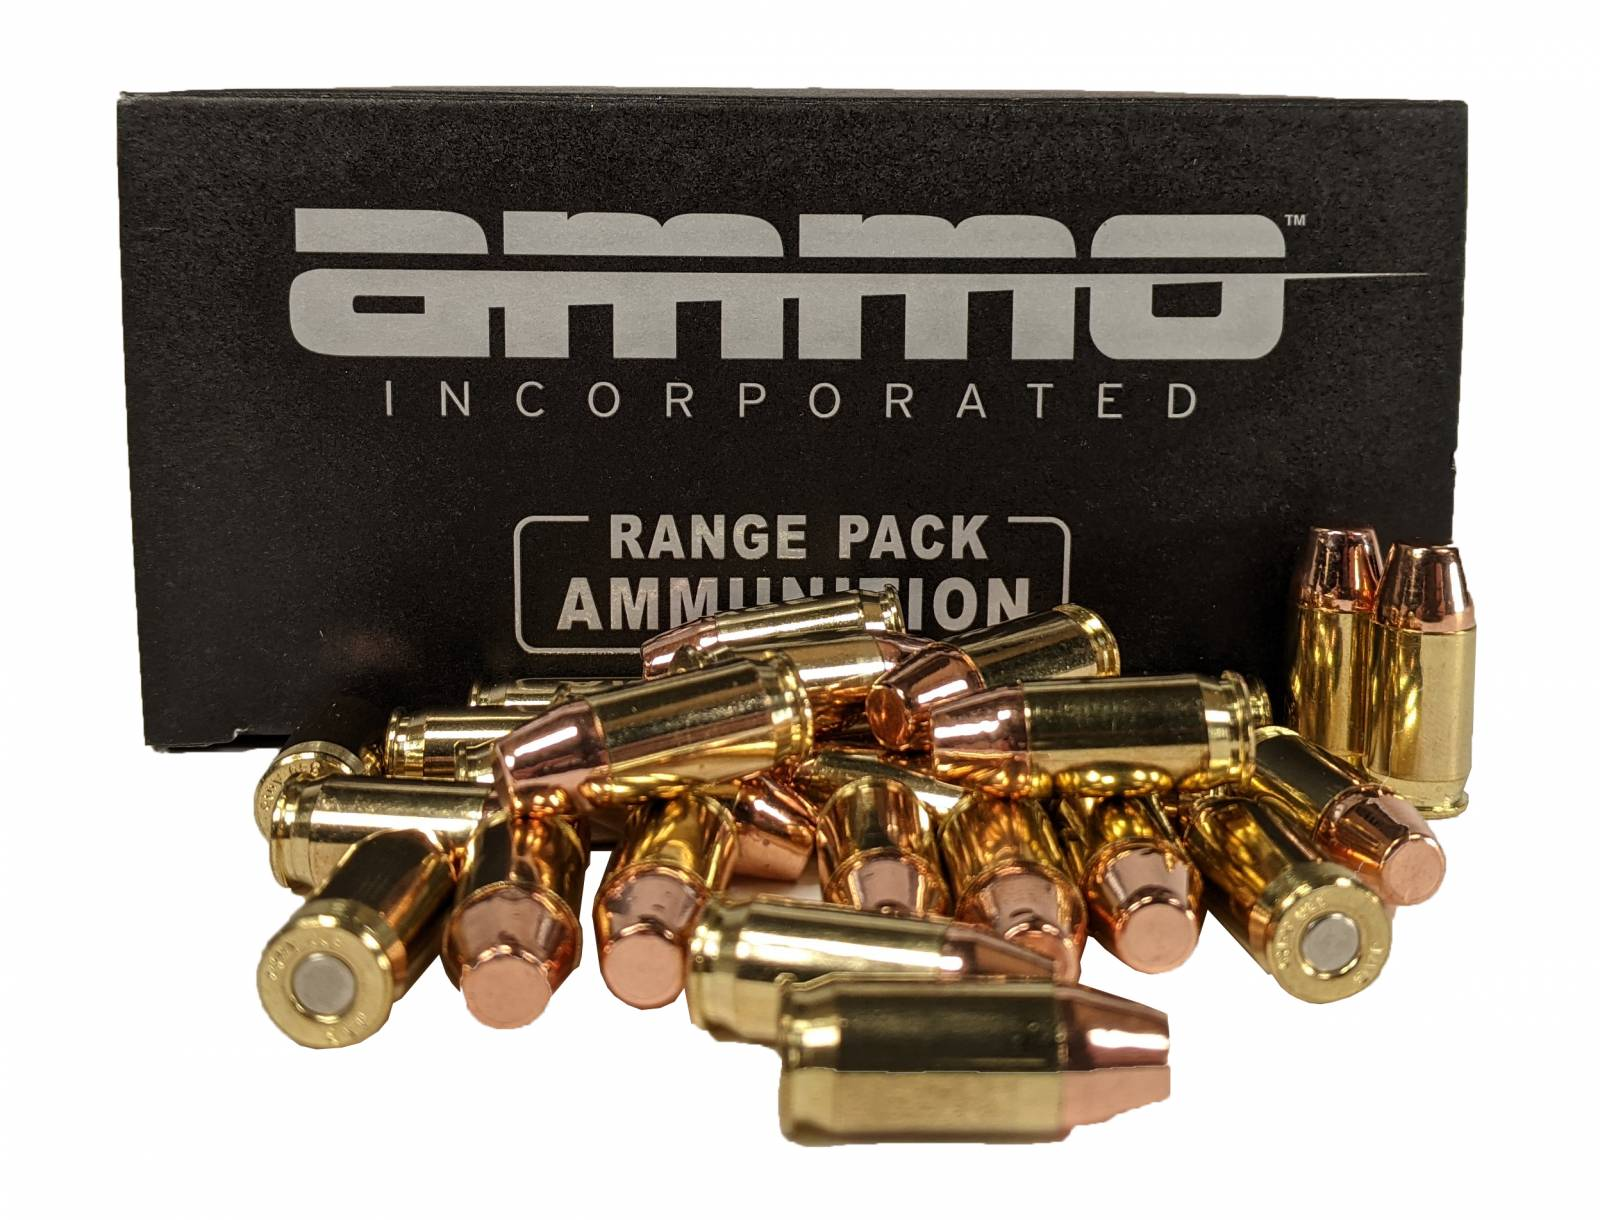 Ammo Inc 380 Auto 124gr TMC-FP 500rd Range Pack